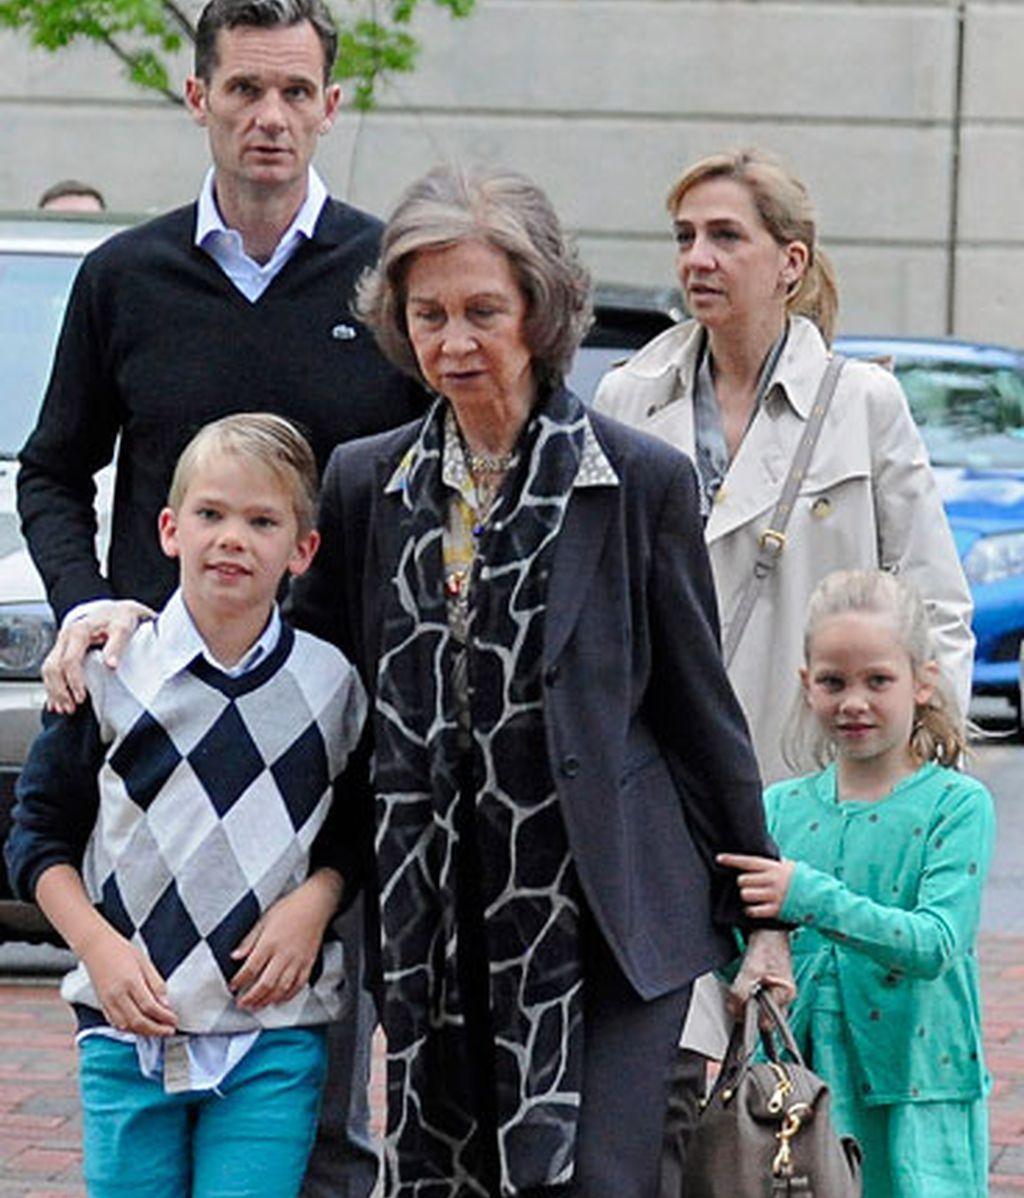 La Reina cumple 75 años